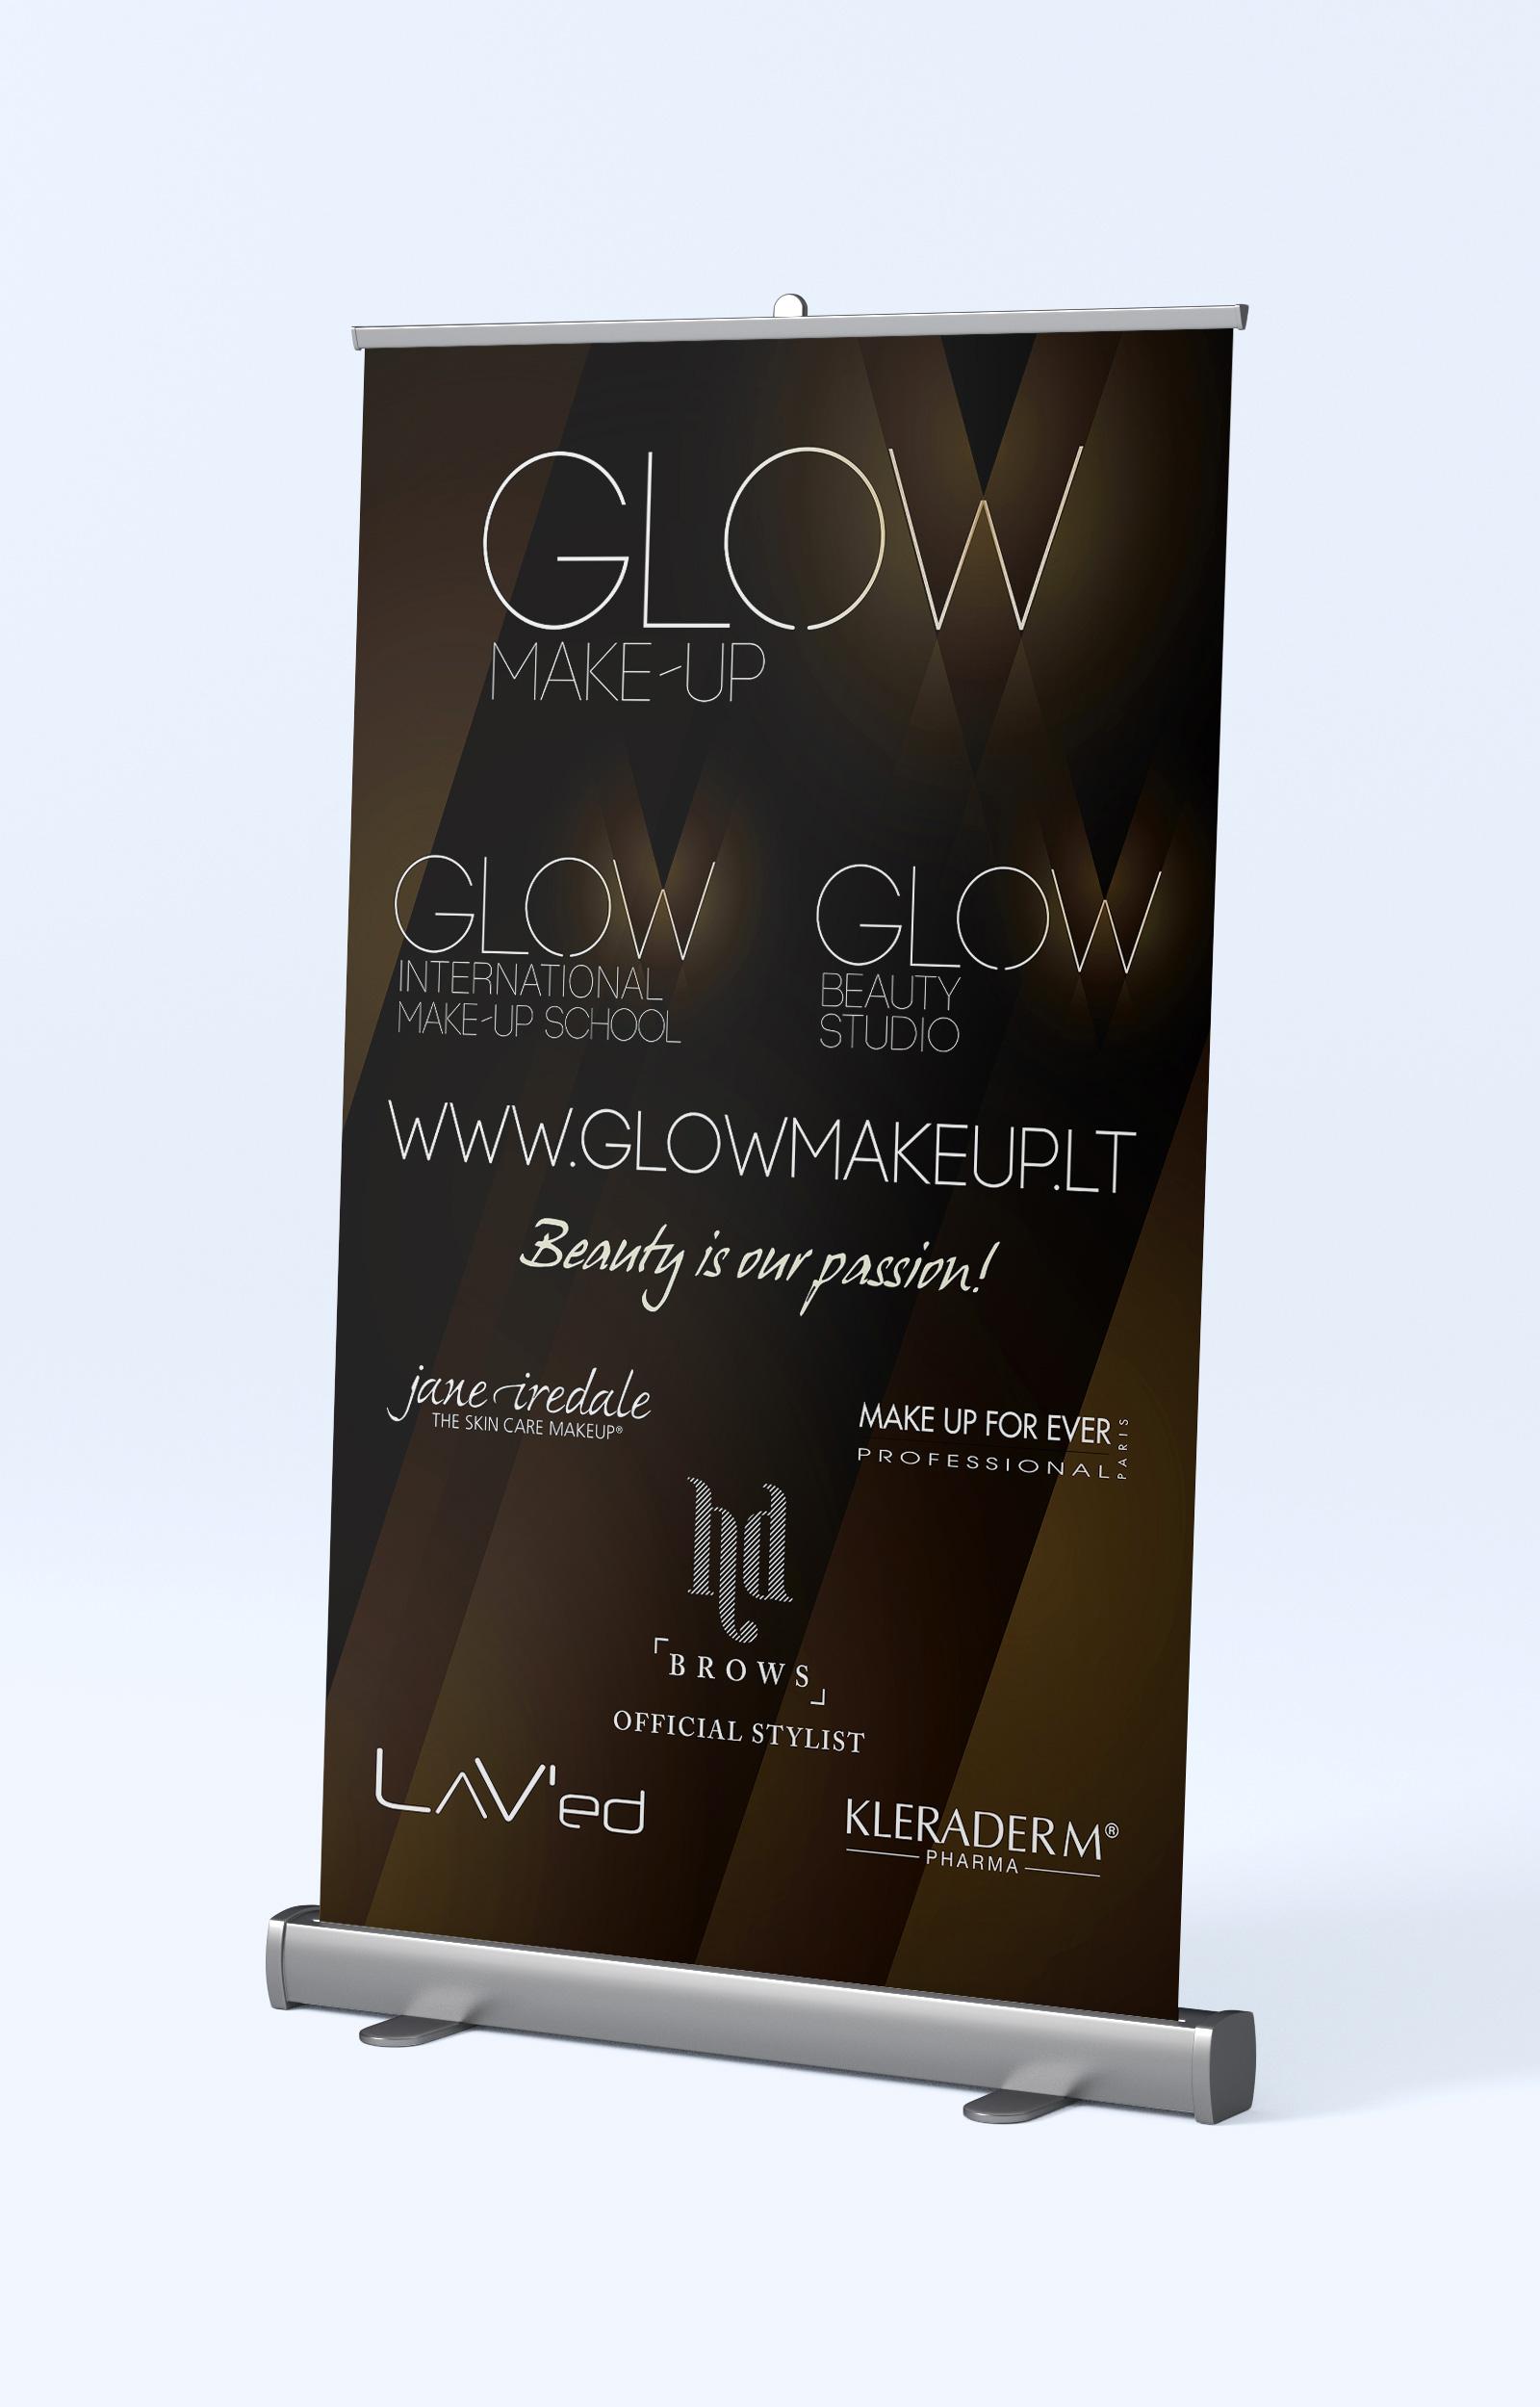 Glow rollup